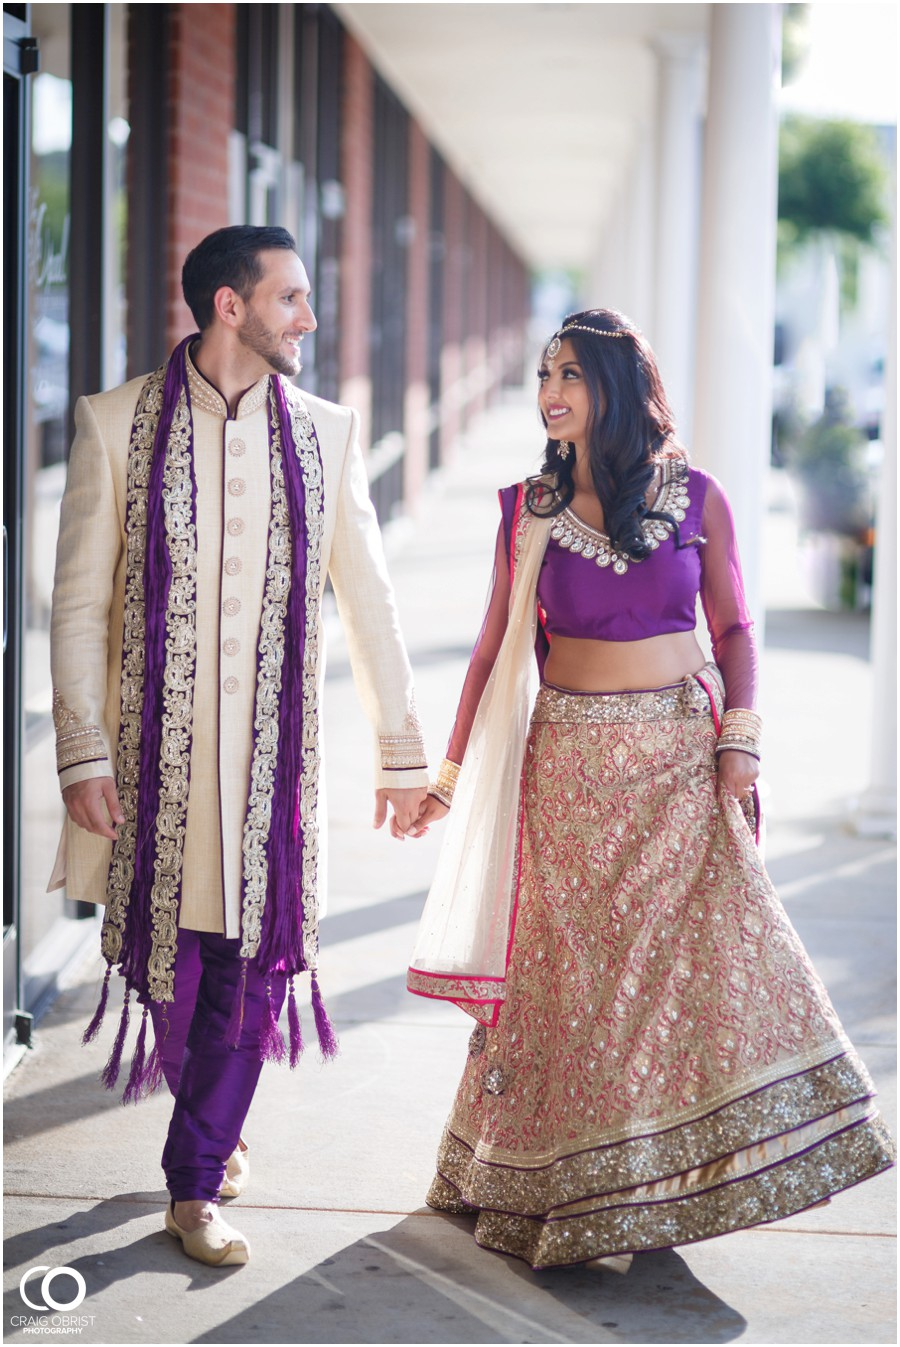 Masuma-Sanjiv-Wedding-lawrenceville-Georgia-Indian_0013.jpg